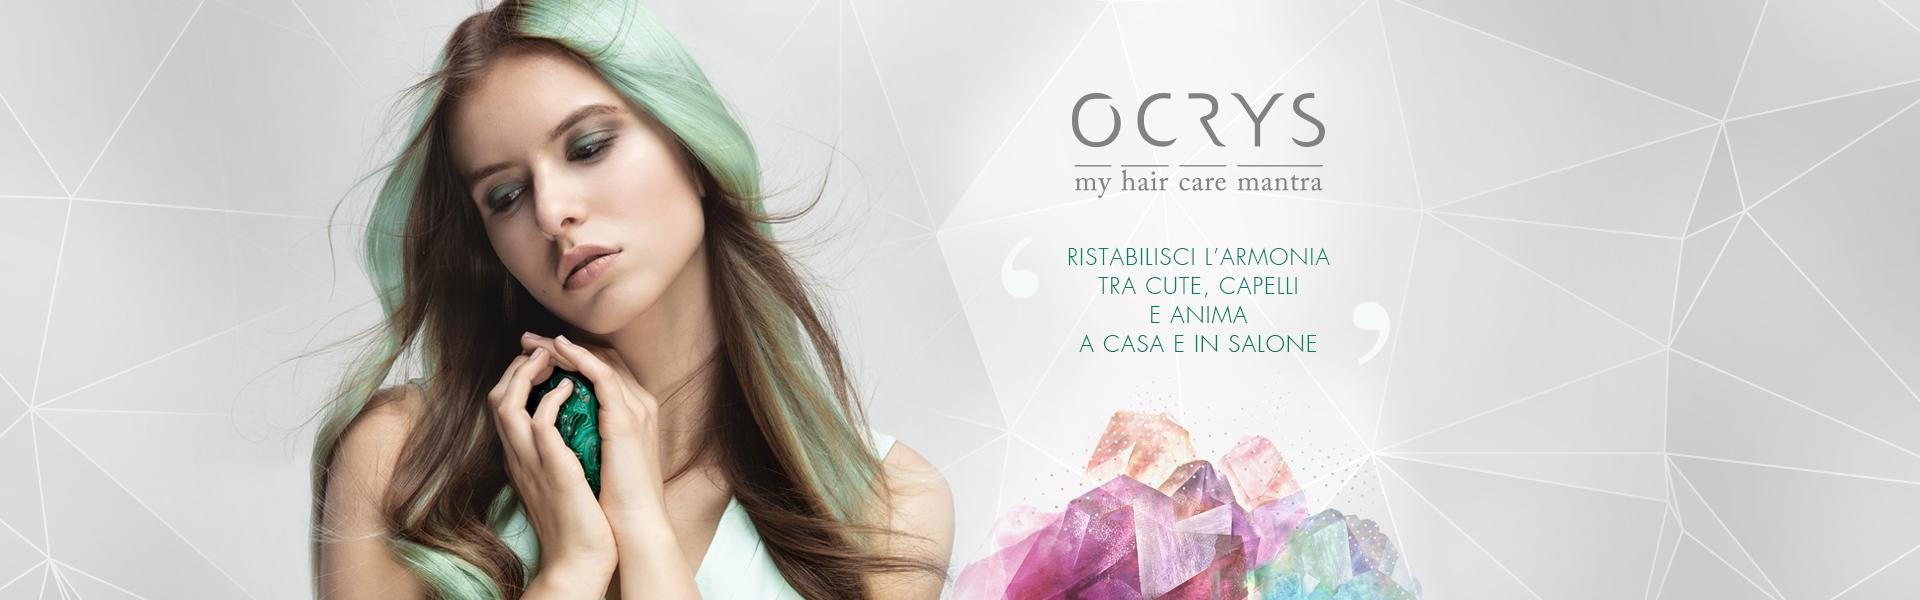 banner_centrali_OCRYS